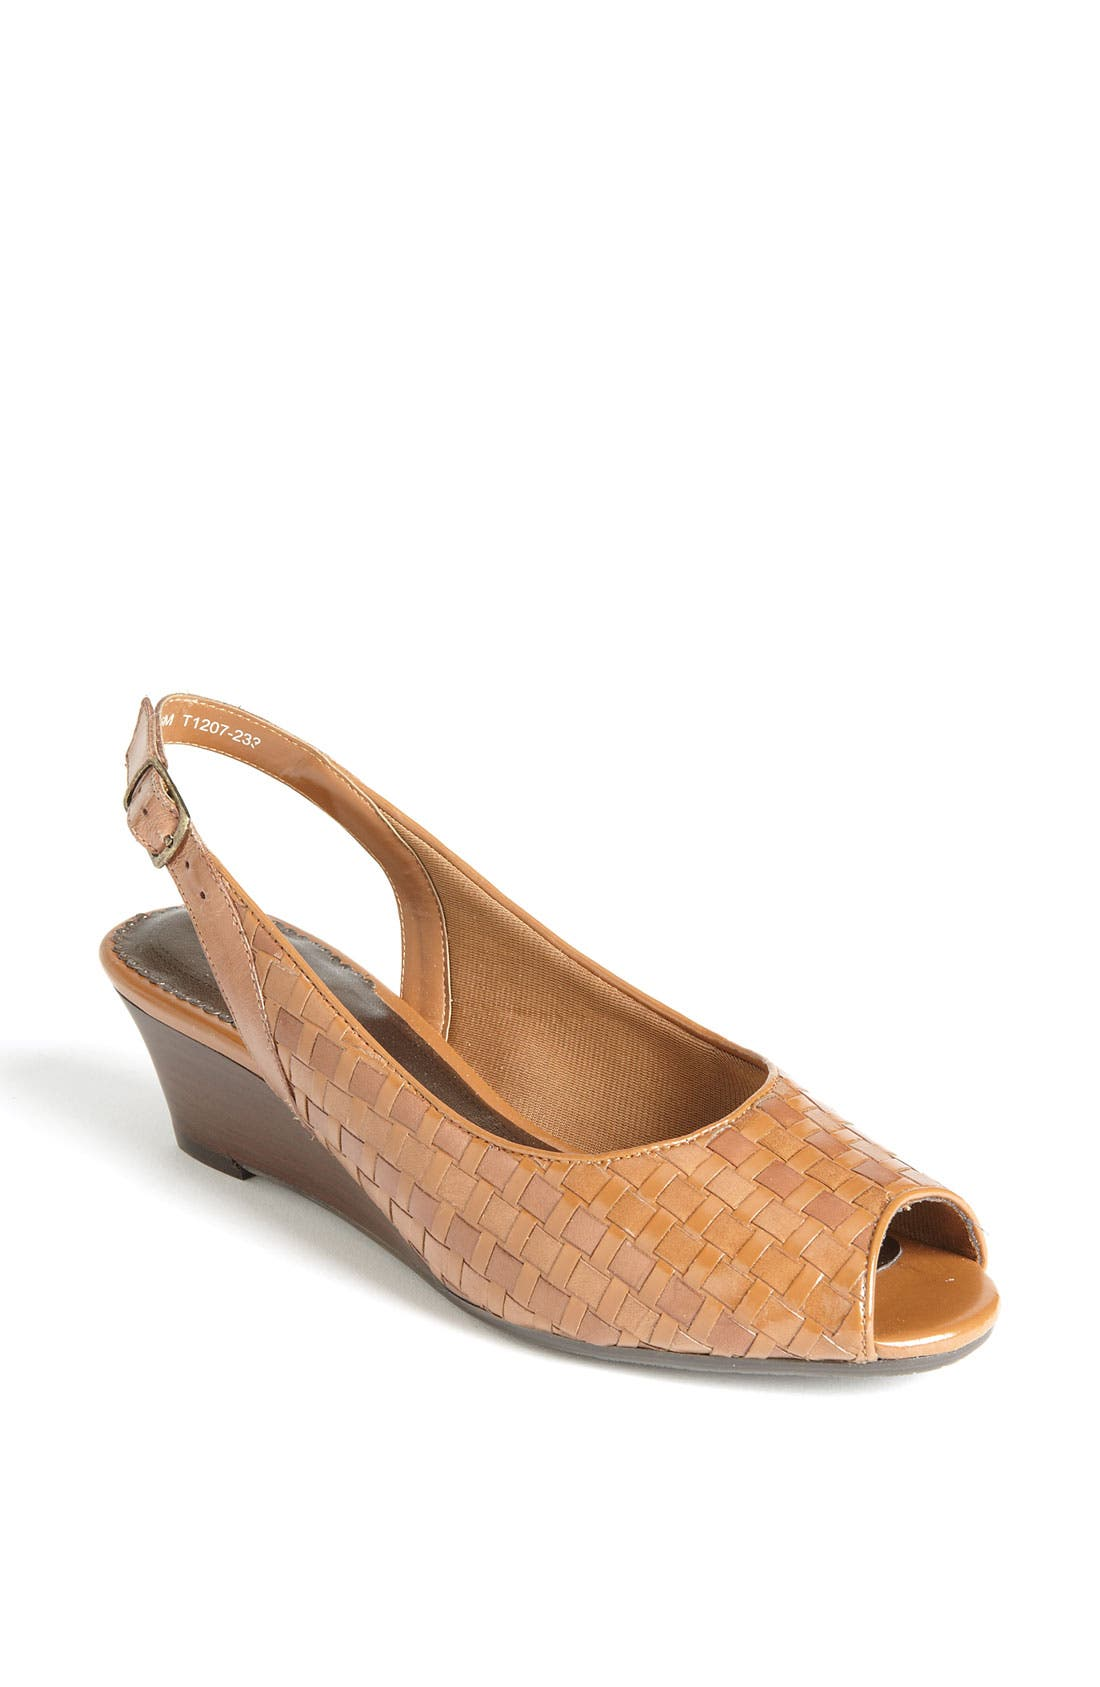 Main Image - Trotters 'Mimi' Sandal